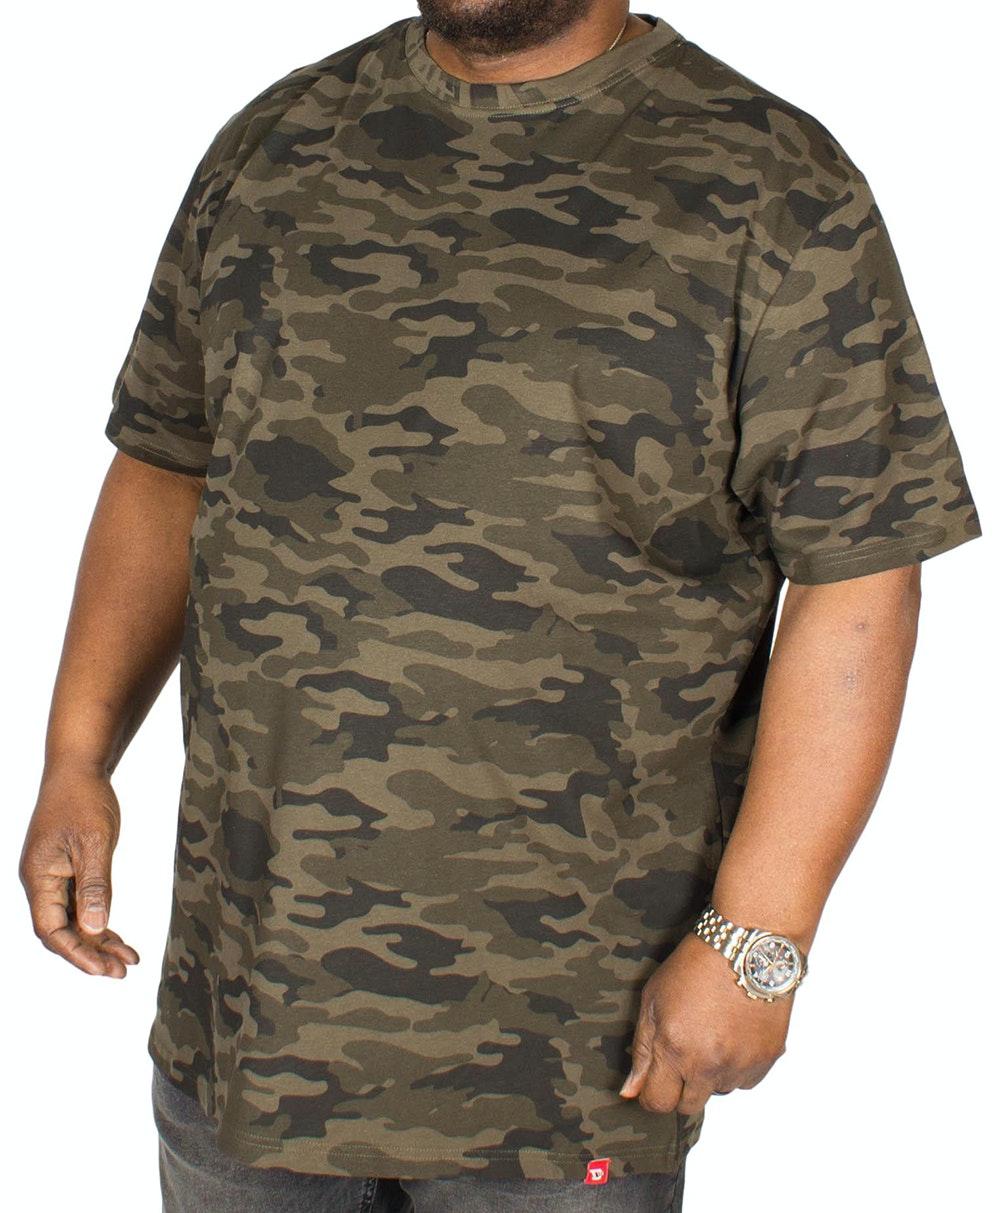 D555 Gaston Camouflage Print T-Shirt Green